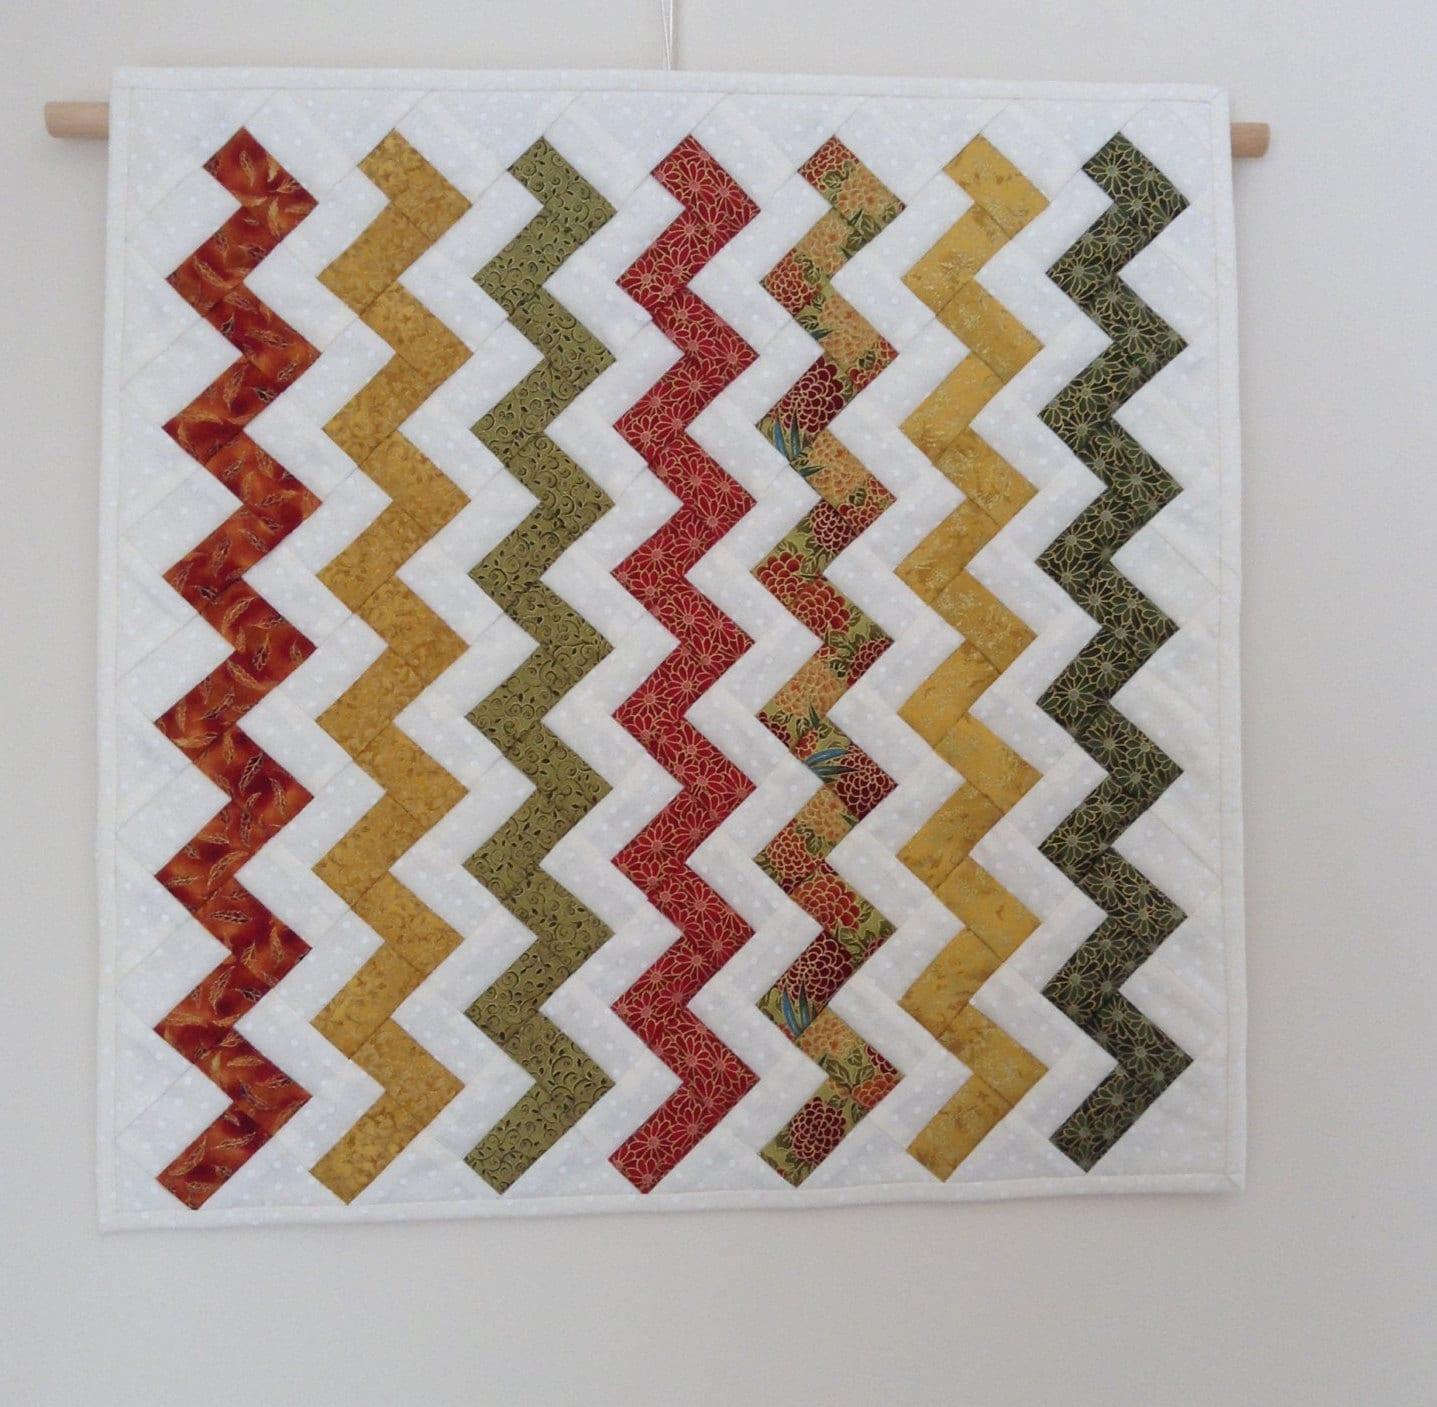 Mini Quilt Block Template Set : miniature quilt pattern mini quilt table topper wall